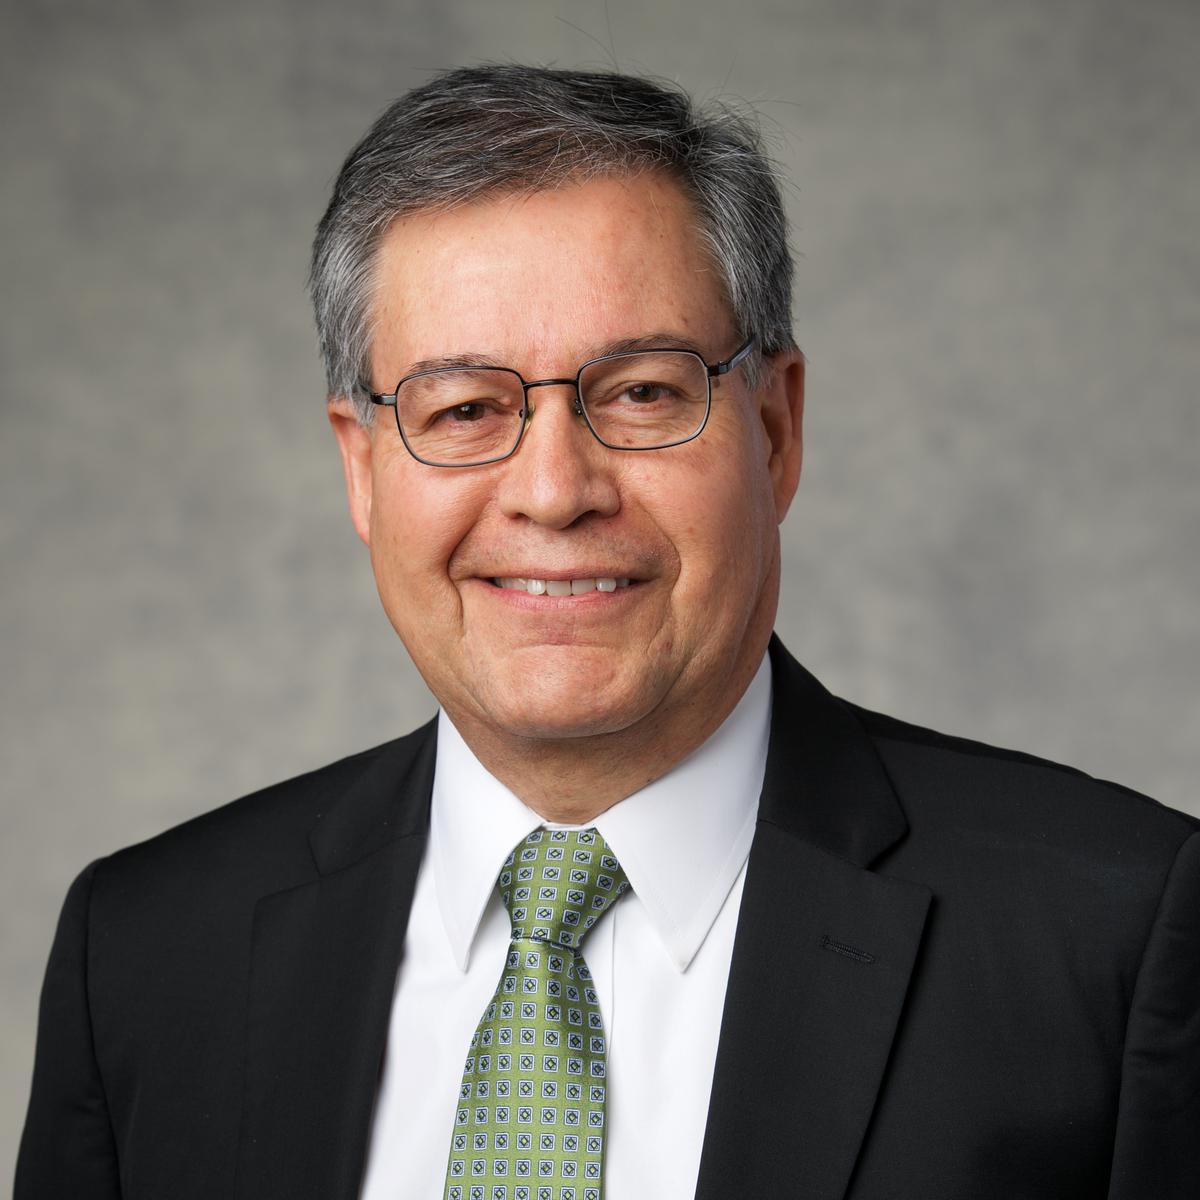 Élder Jorge A. García Licona